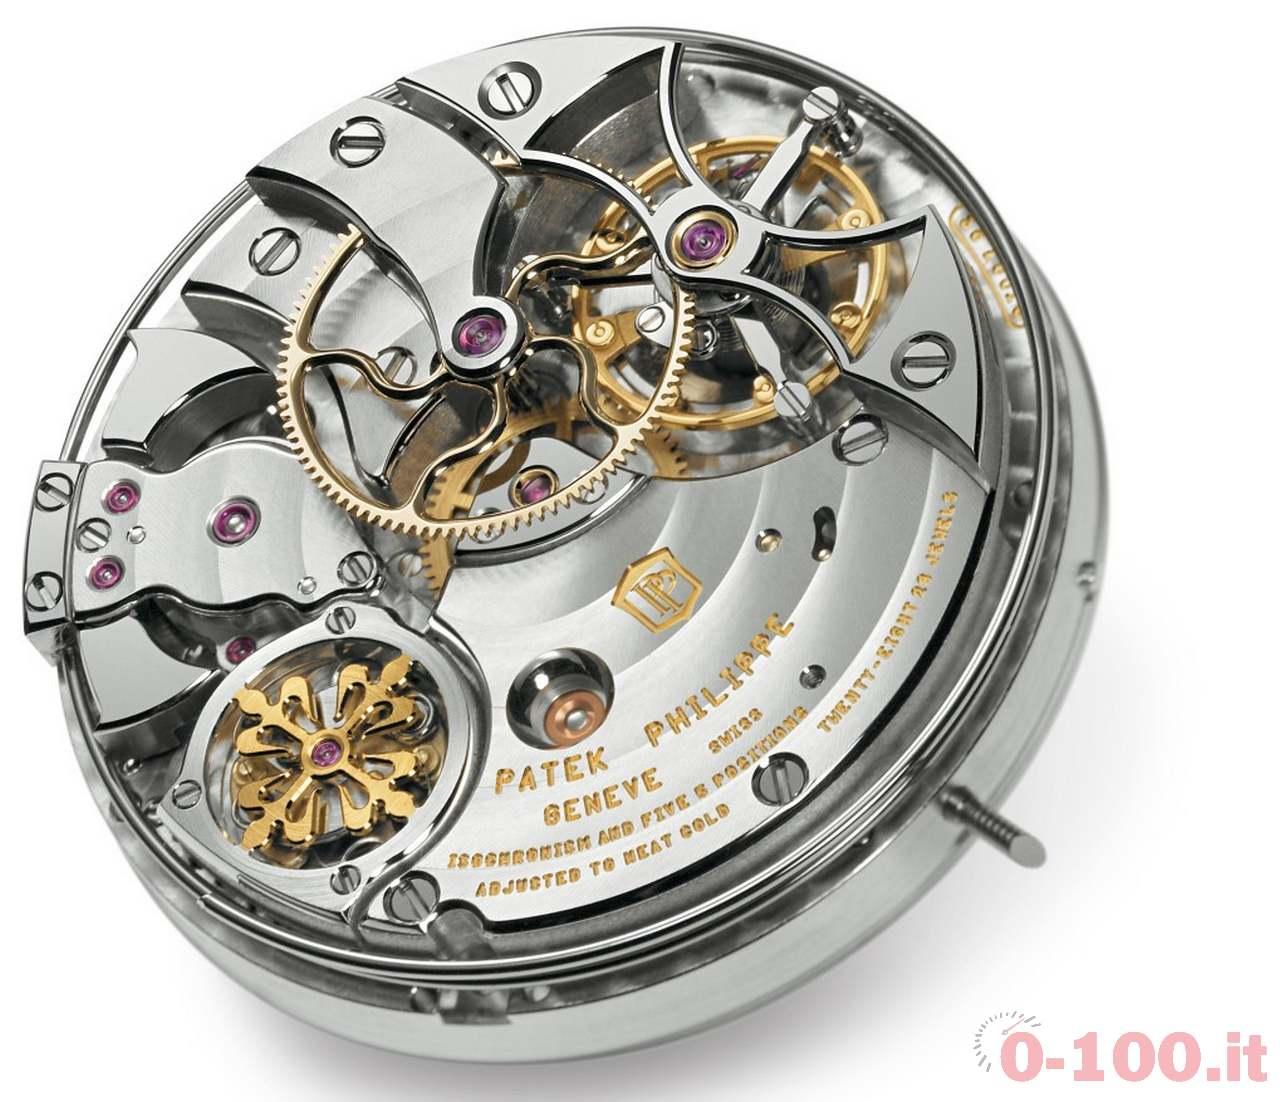 only-watch-2015-il-patek-philippe-5016a-prezzo-price_0-1002